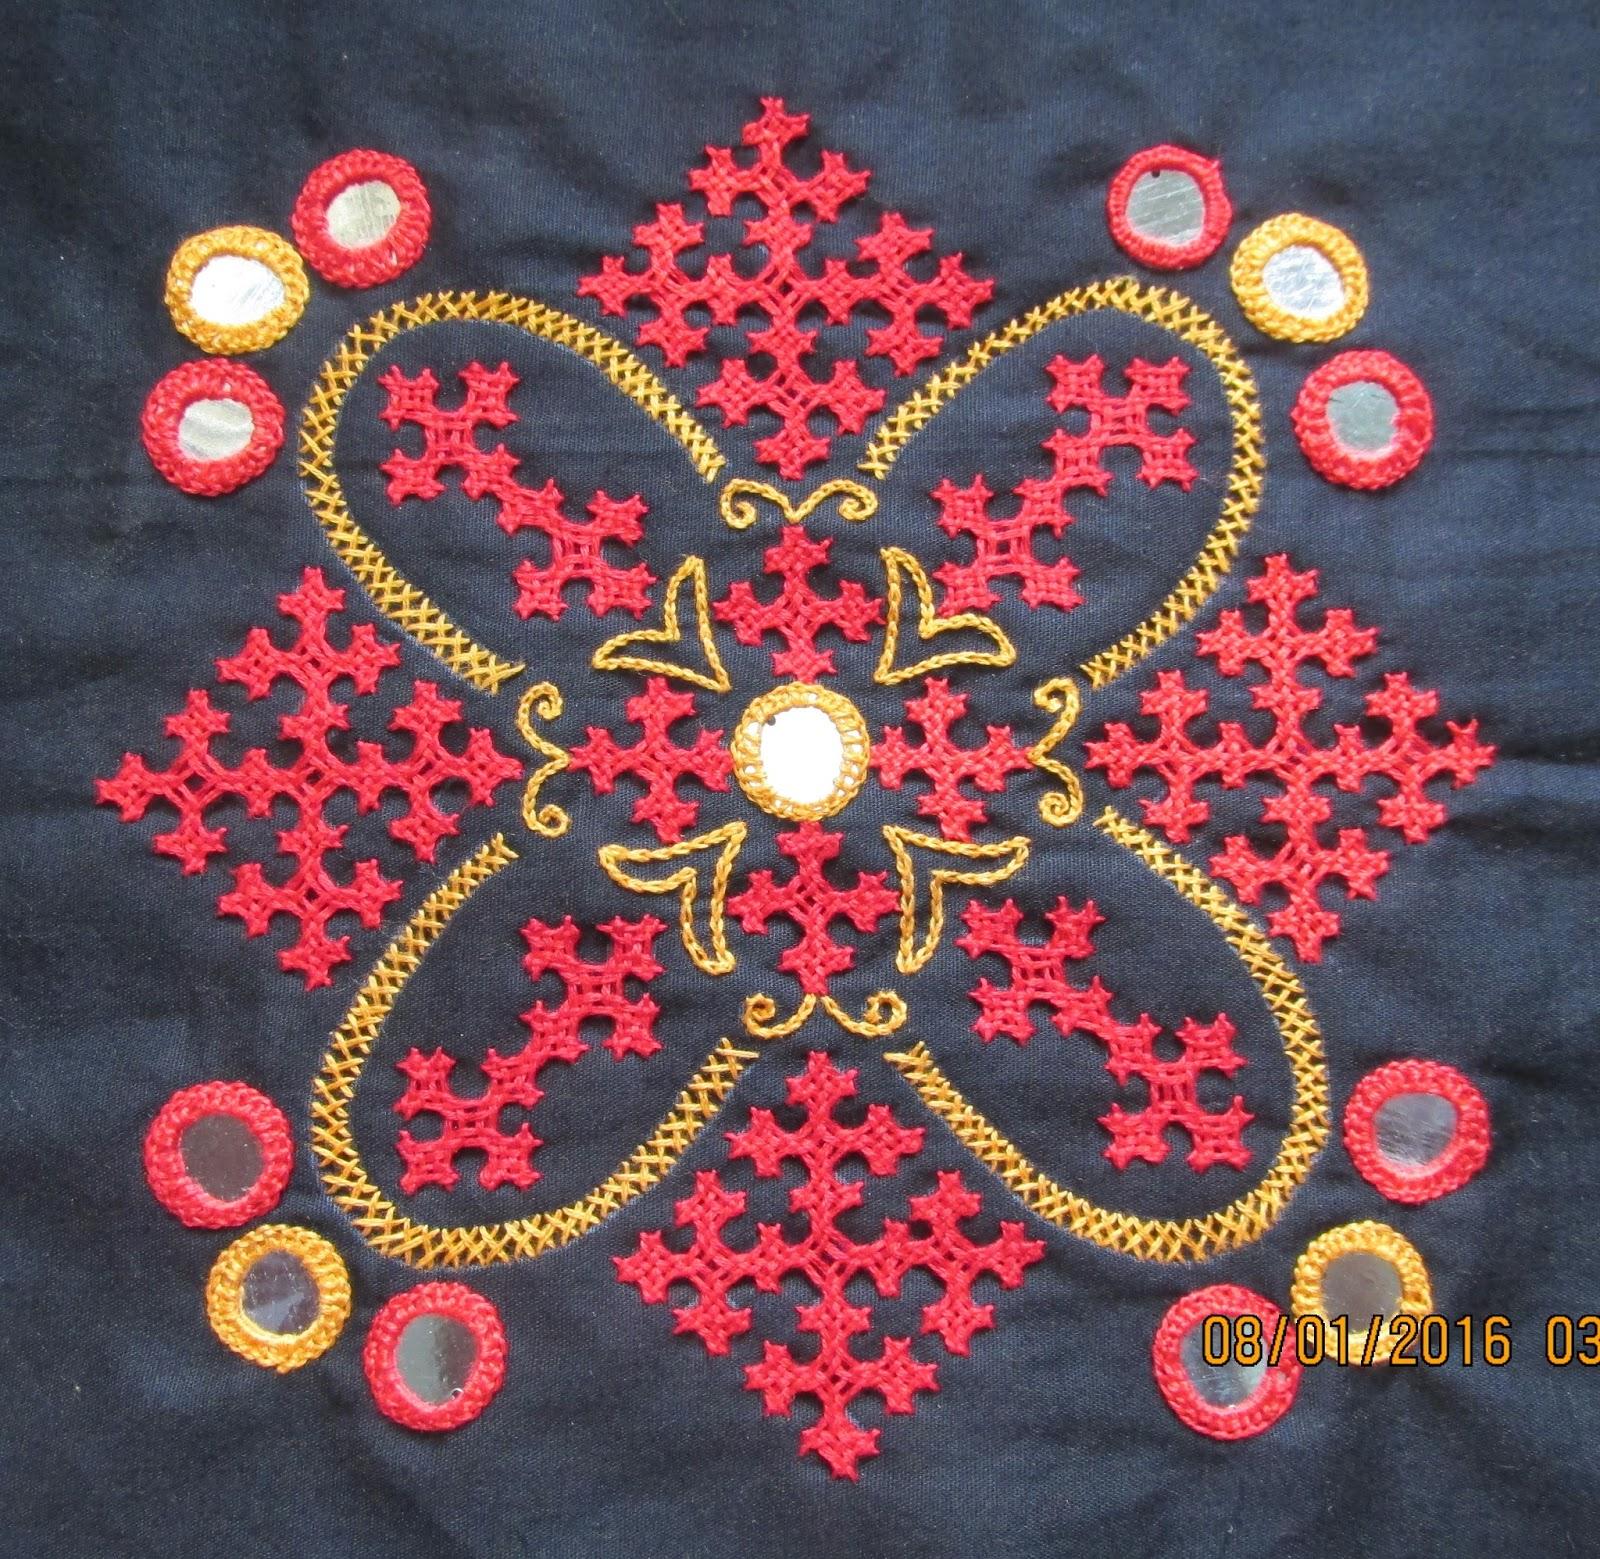 My craft works kutch work motif and a cross stitch ta da